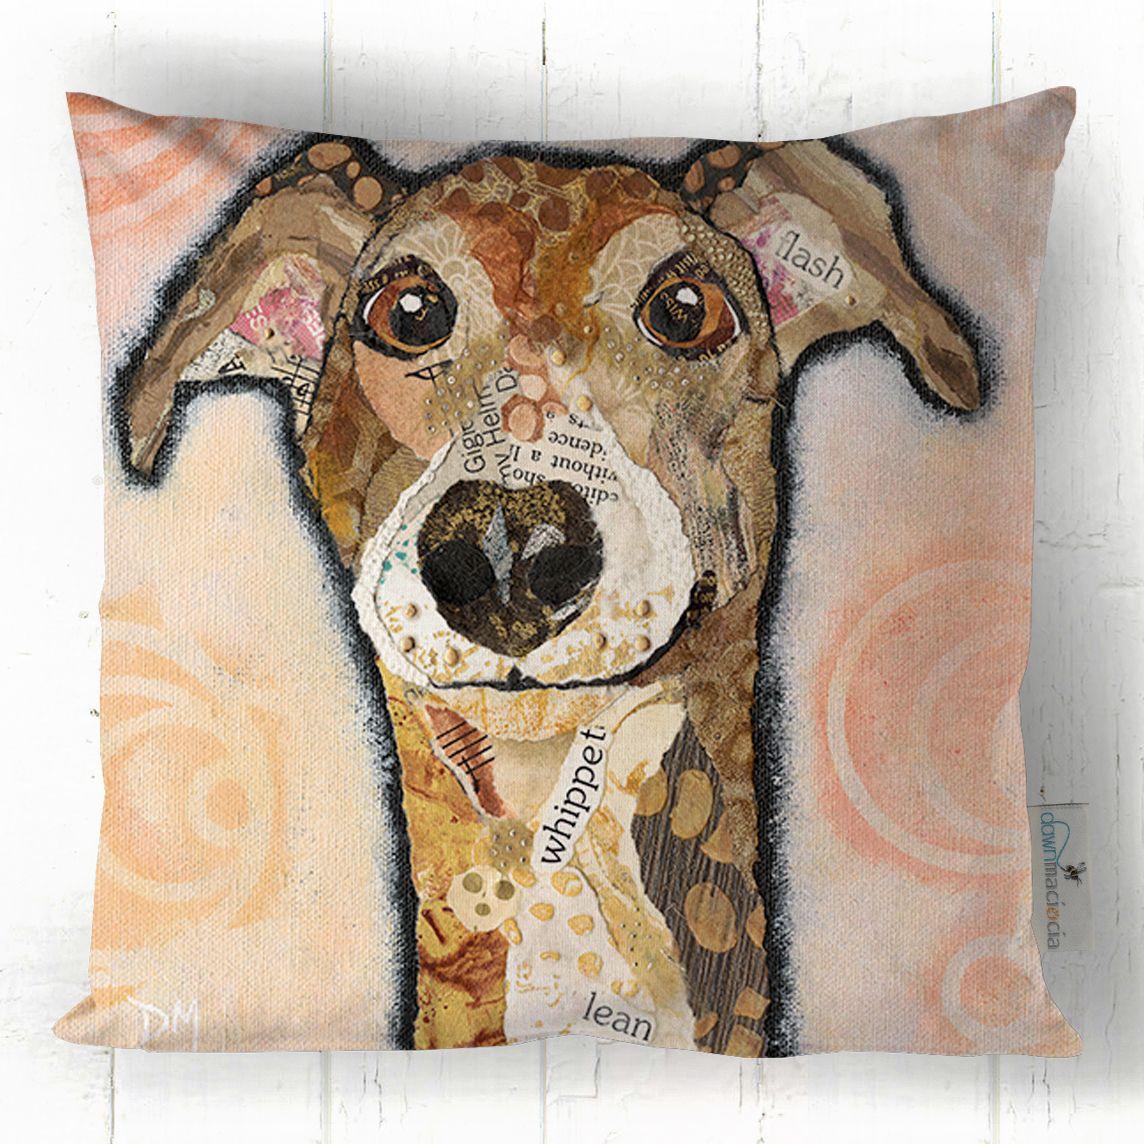 Whippet Hound Cushion Handmade in UK by Dawn Maciocia